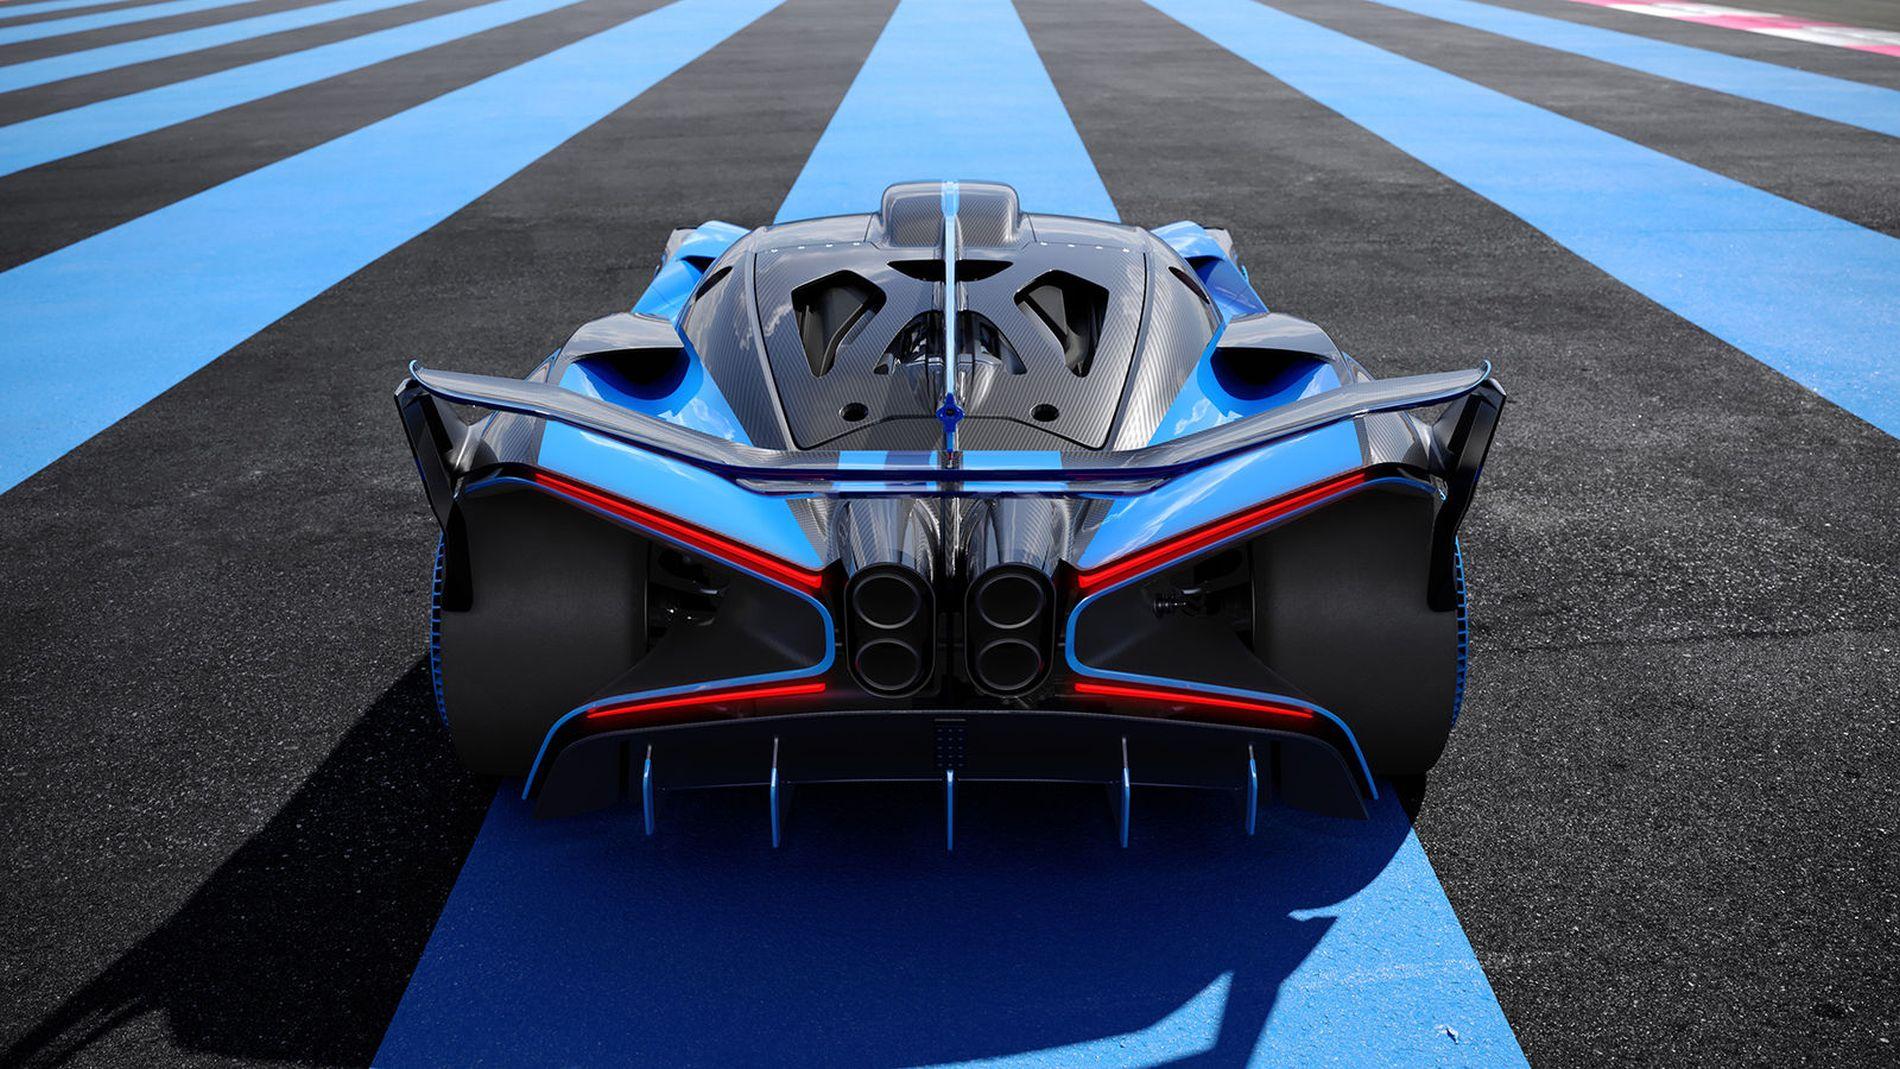 Bugatti Bolide - doar 20 de secunde pentru repriza de la 0 la 500 km/h